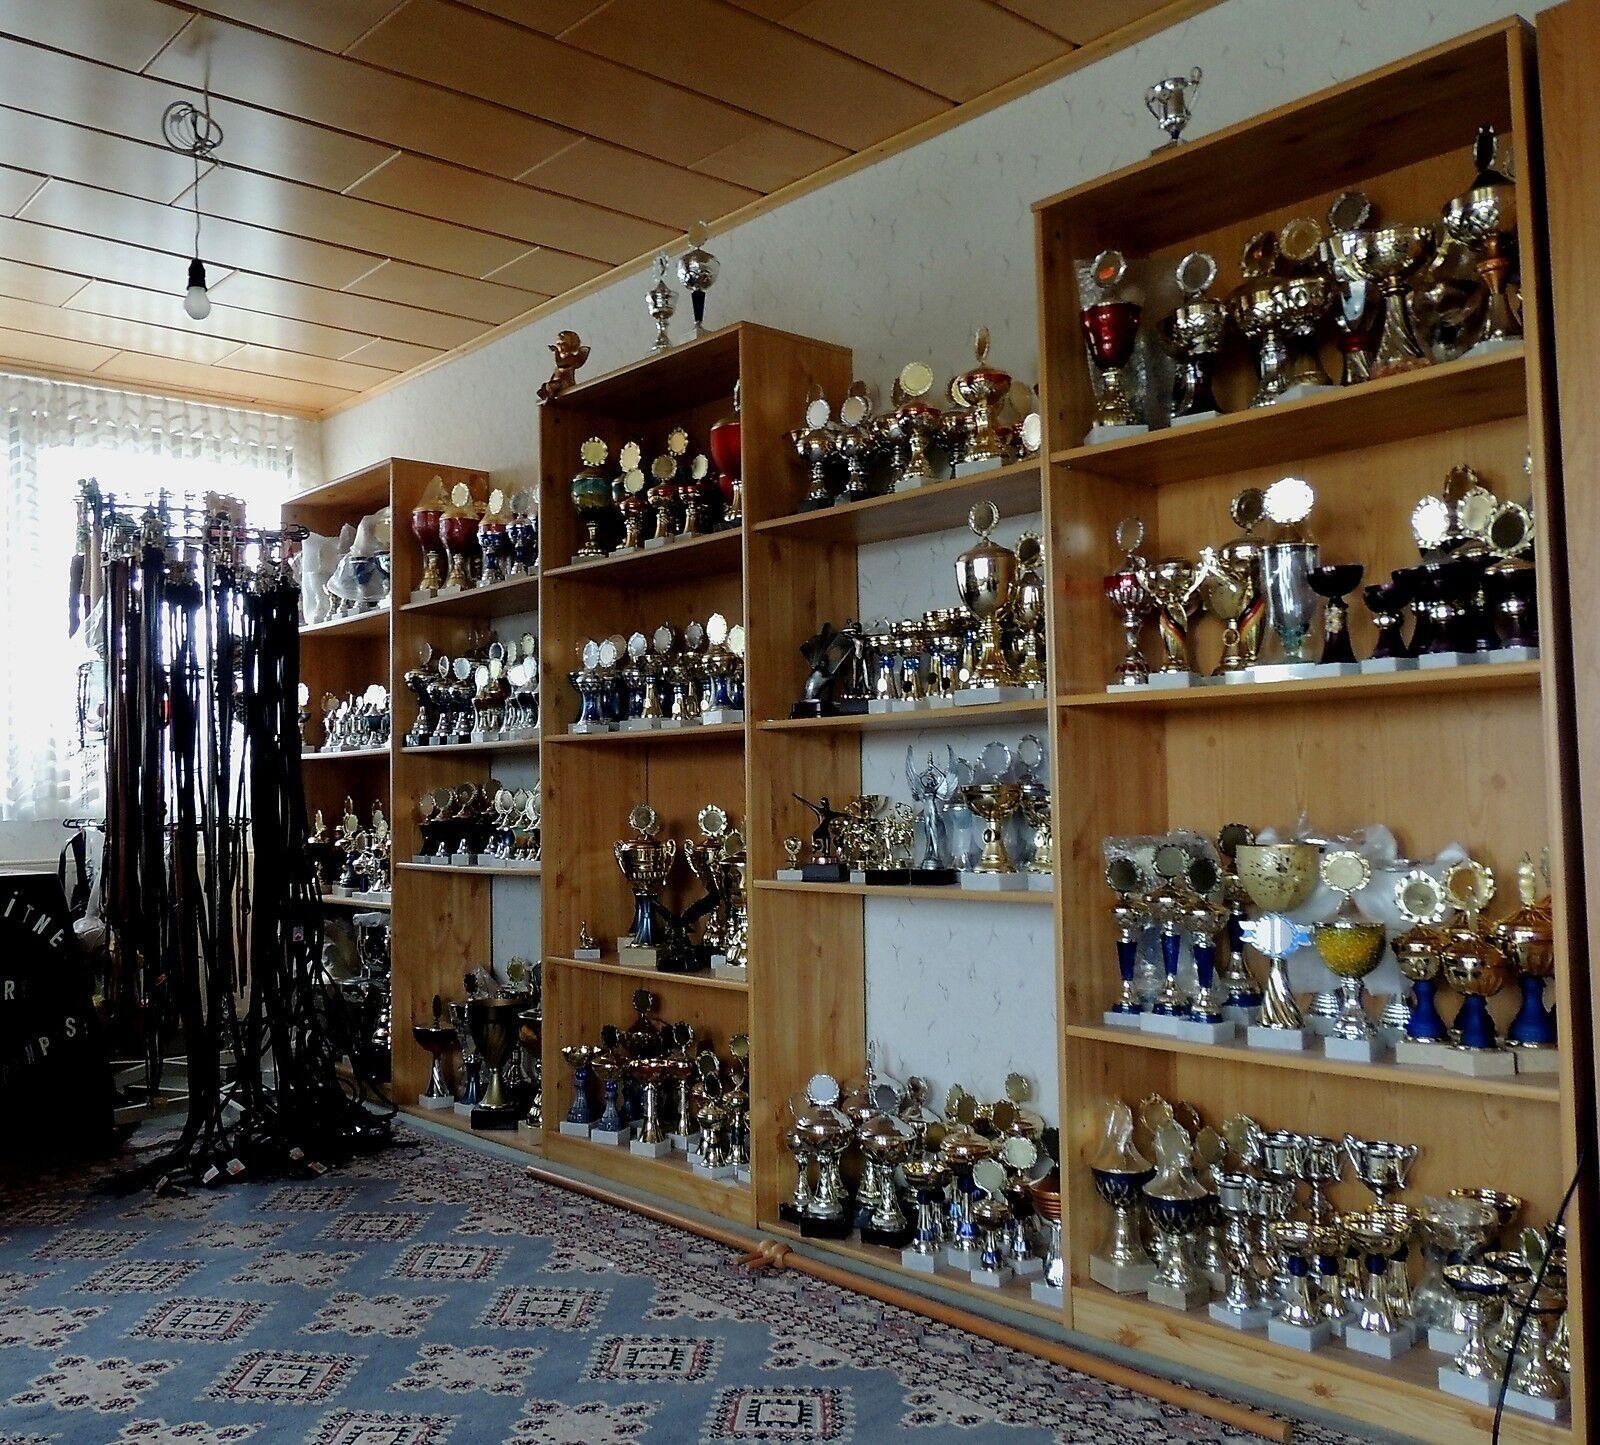 60 pequeños einzelpokale diferentes trofeos con tapa + emblema sorpresa